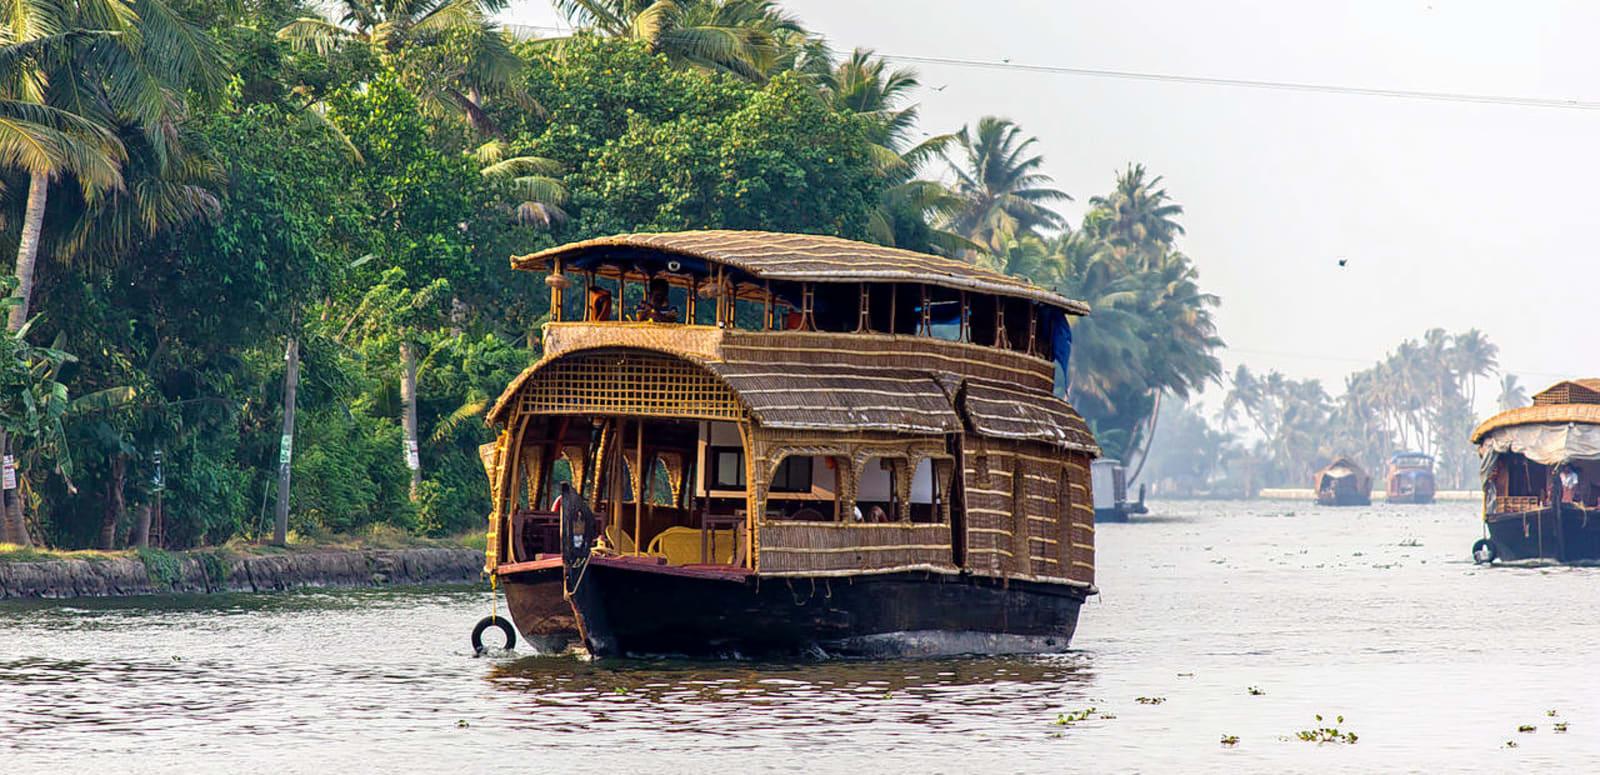 1493301611_1280px-houseboat_in_alleppey_(7057374293).jpg